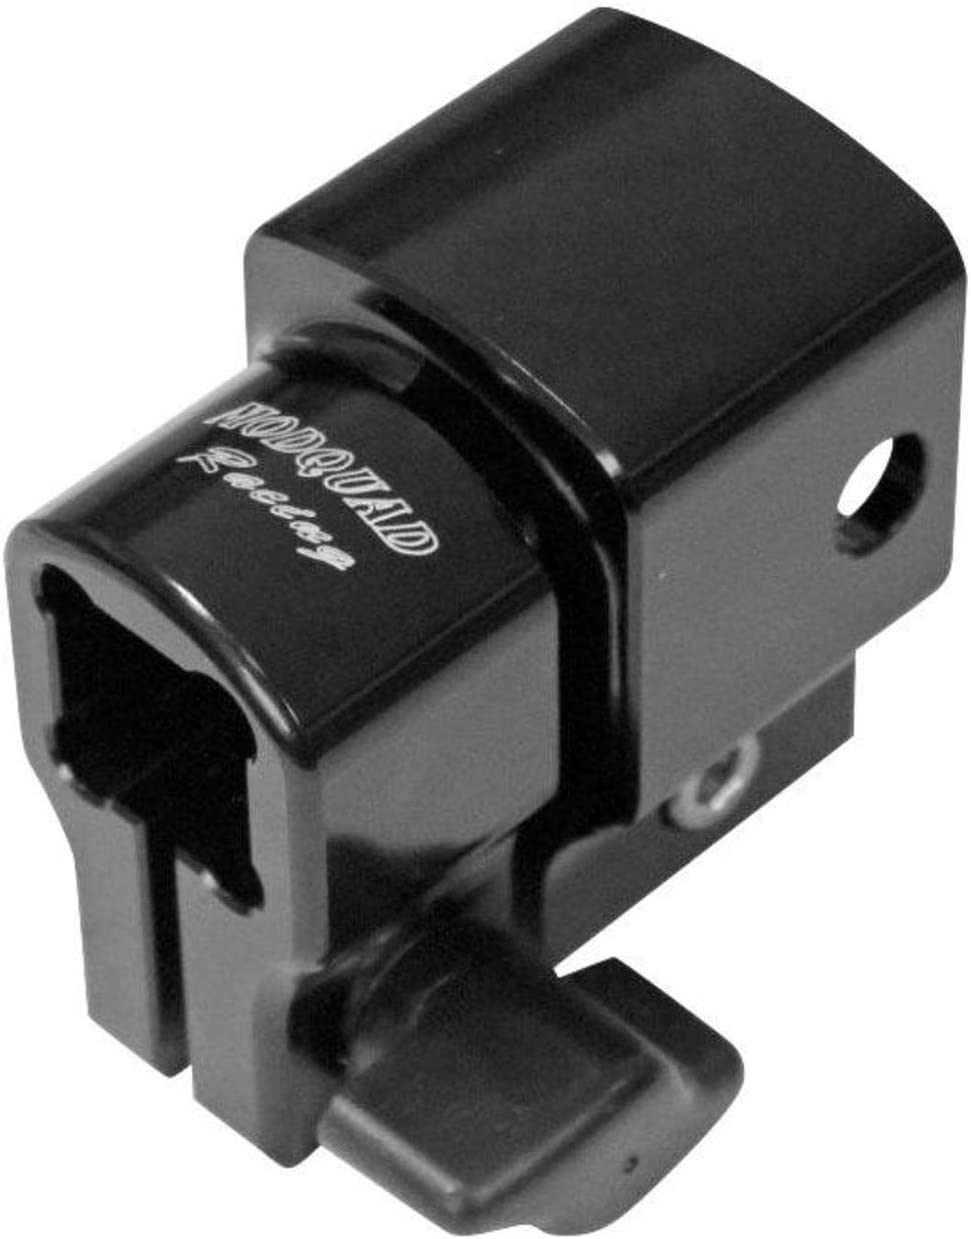 ModQuad Grab Handle Black RZR-OS-AR-1K-BLK Anti-Rattle Lock